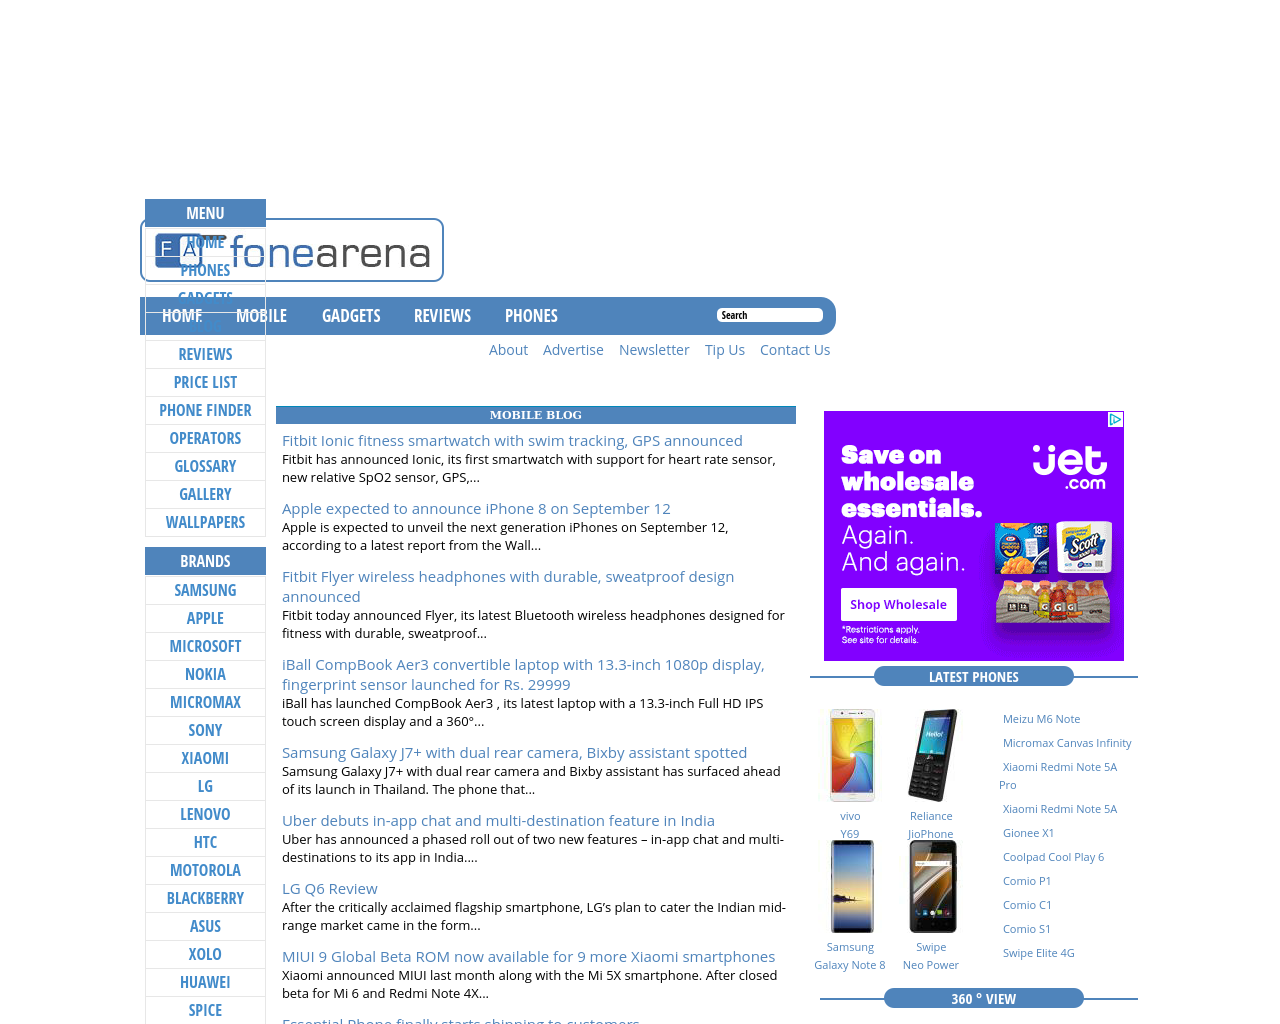 fonearena-Advertising-Reviews-Pricing